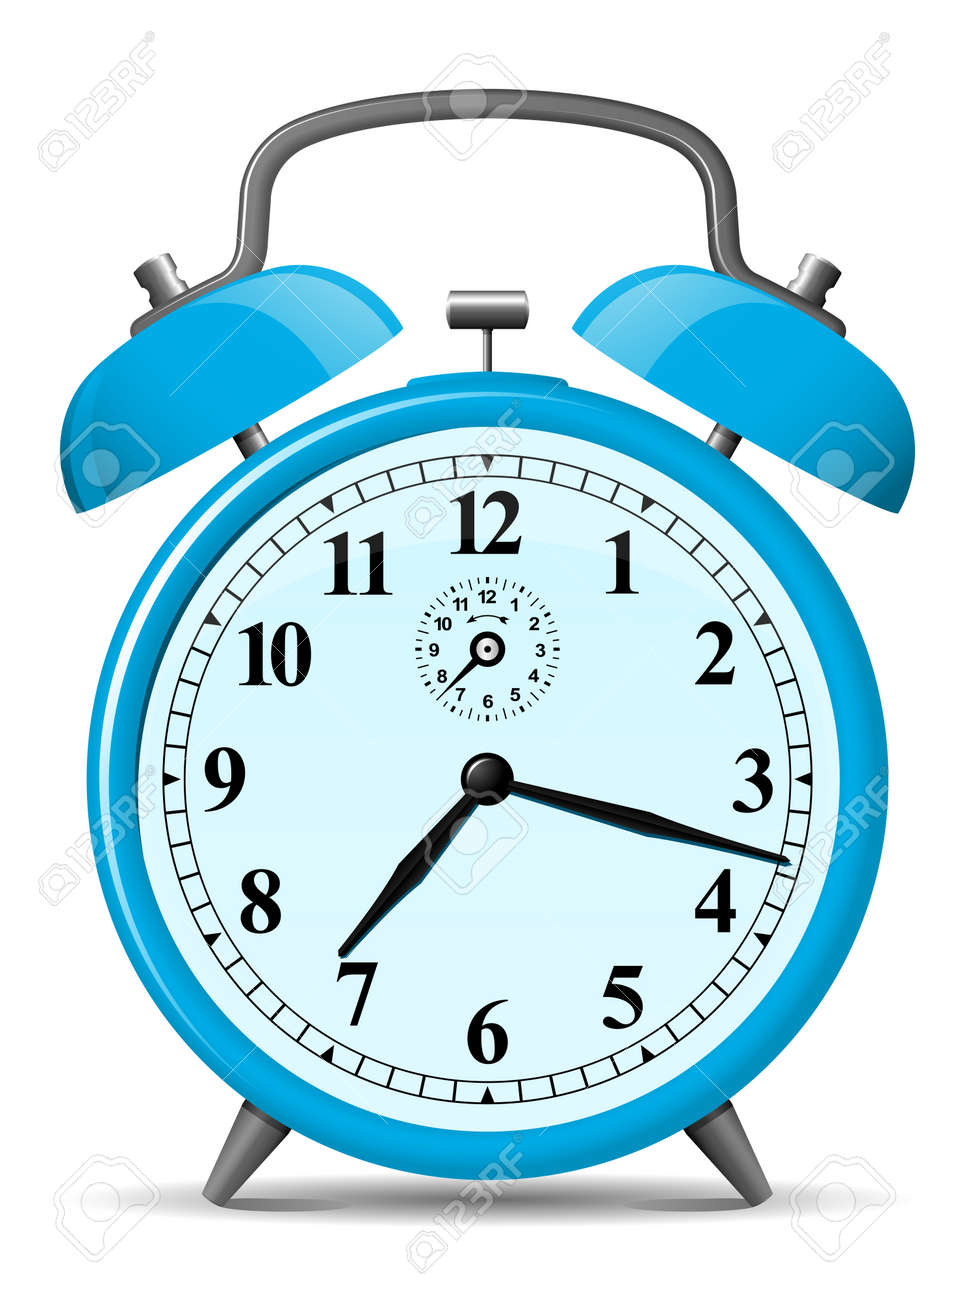 Image result for blue alarm clock clip art